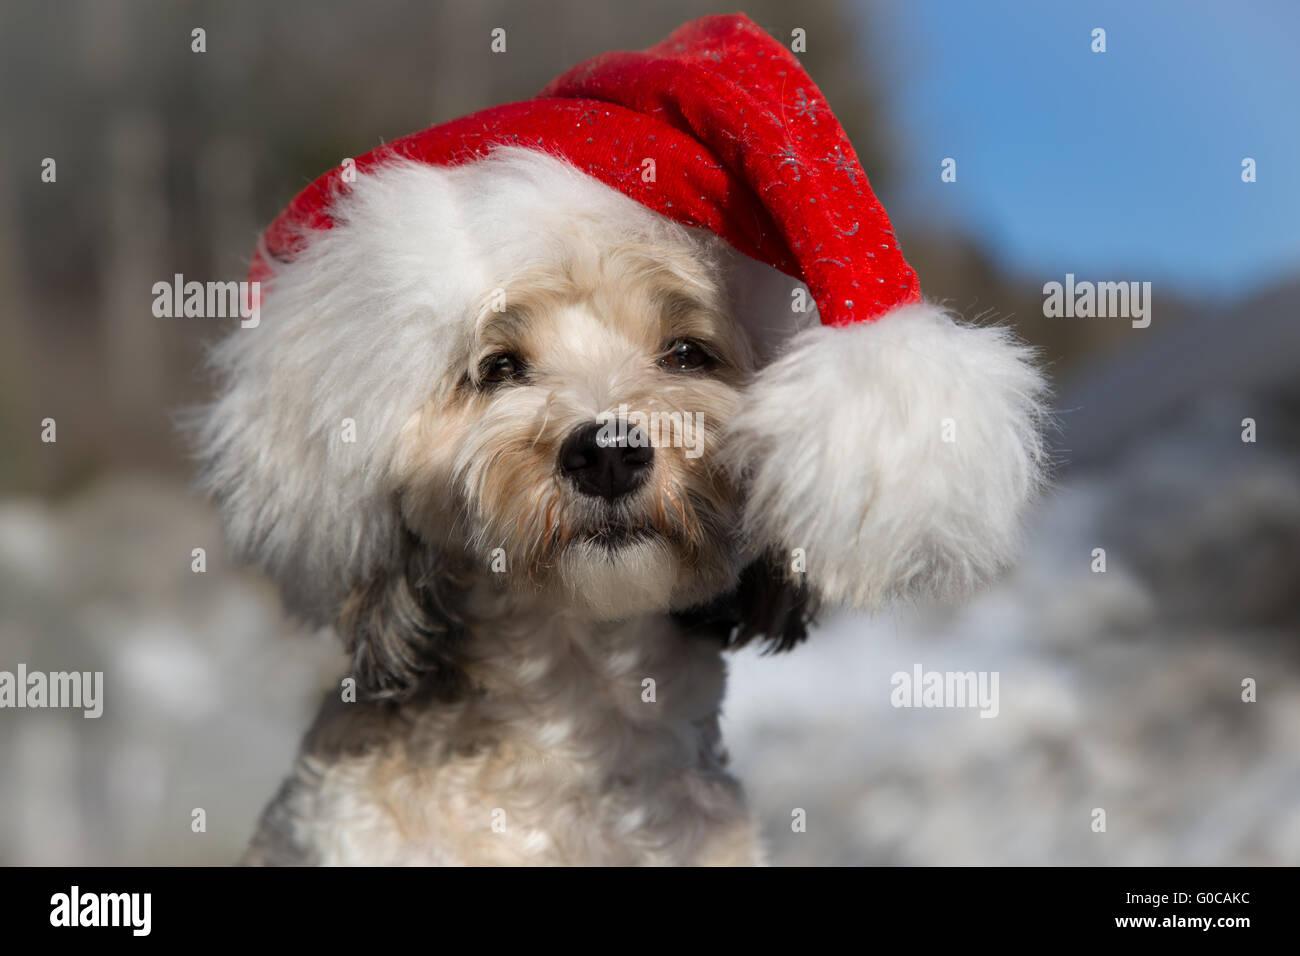 Santa Dog - Stock Image